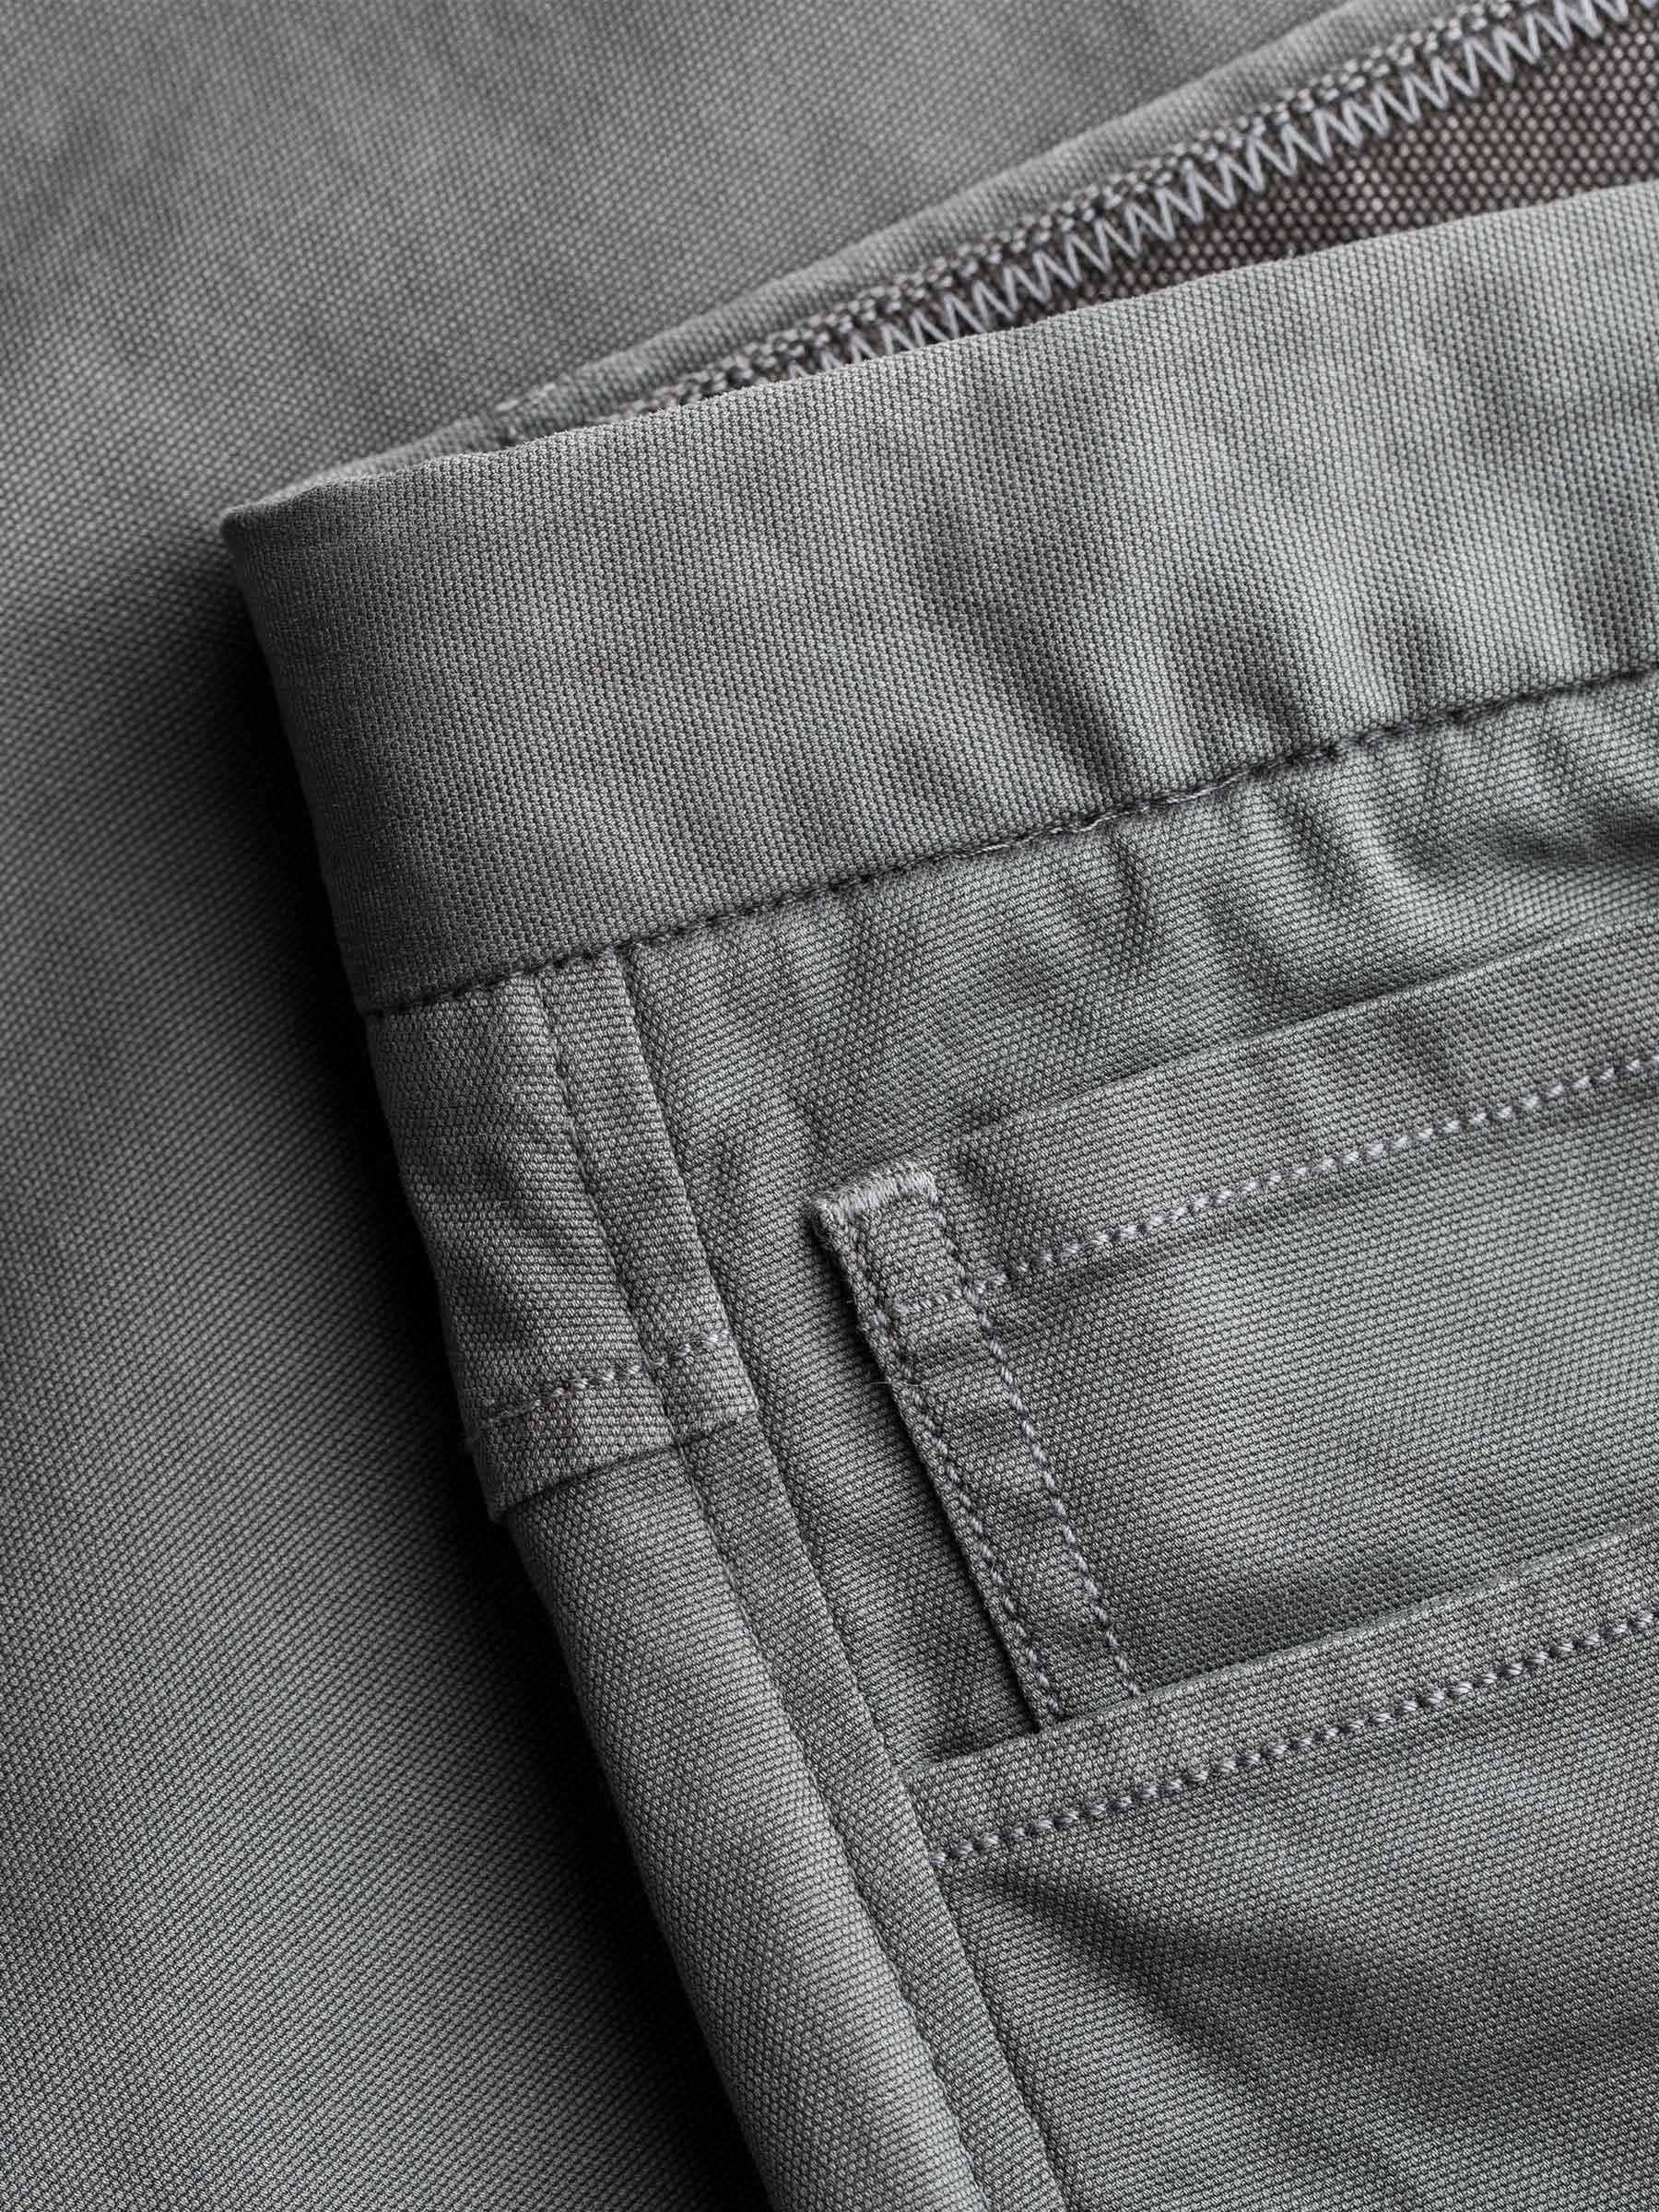 Buck Mason - Rover Vintage Canvas 5-Pocket Pant